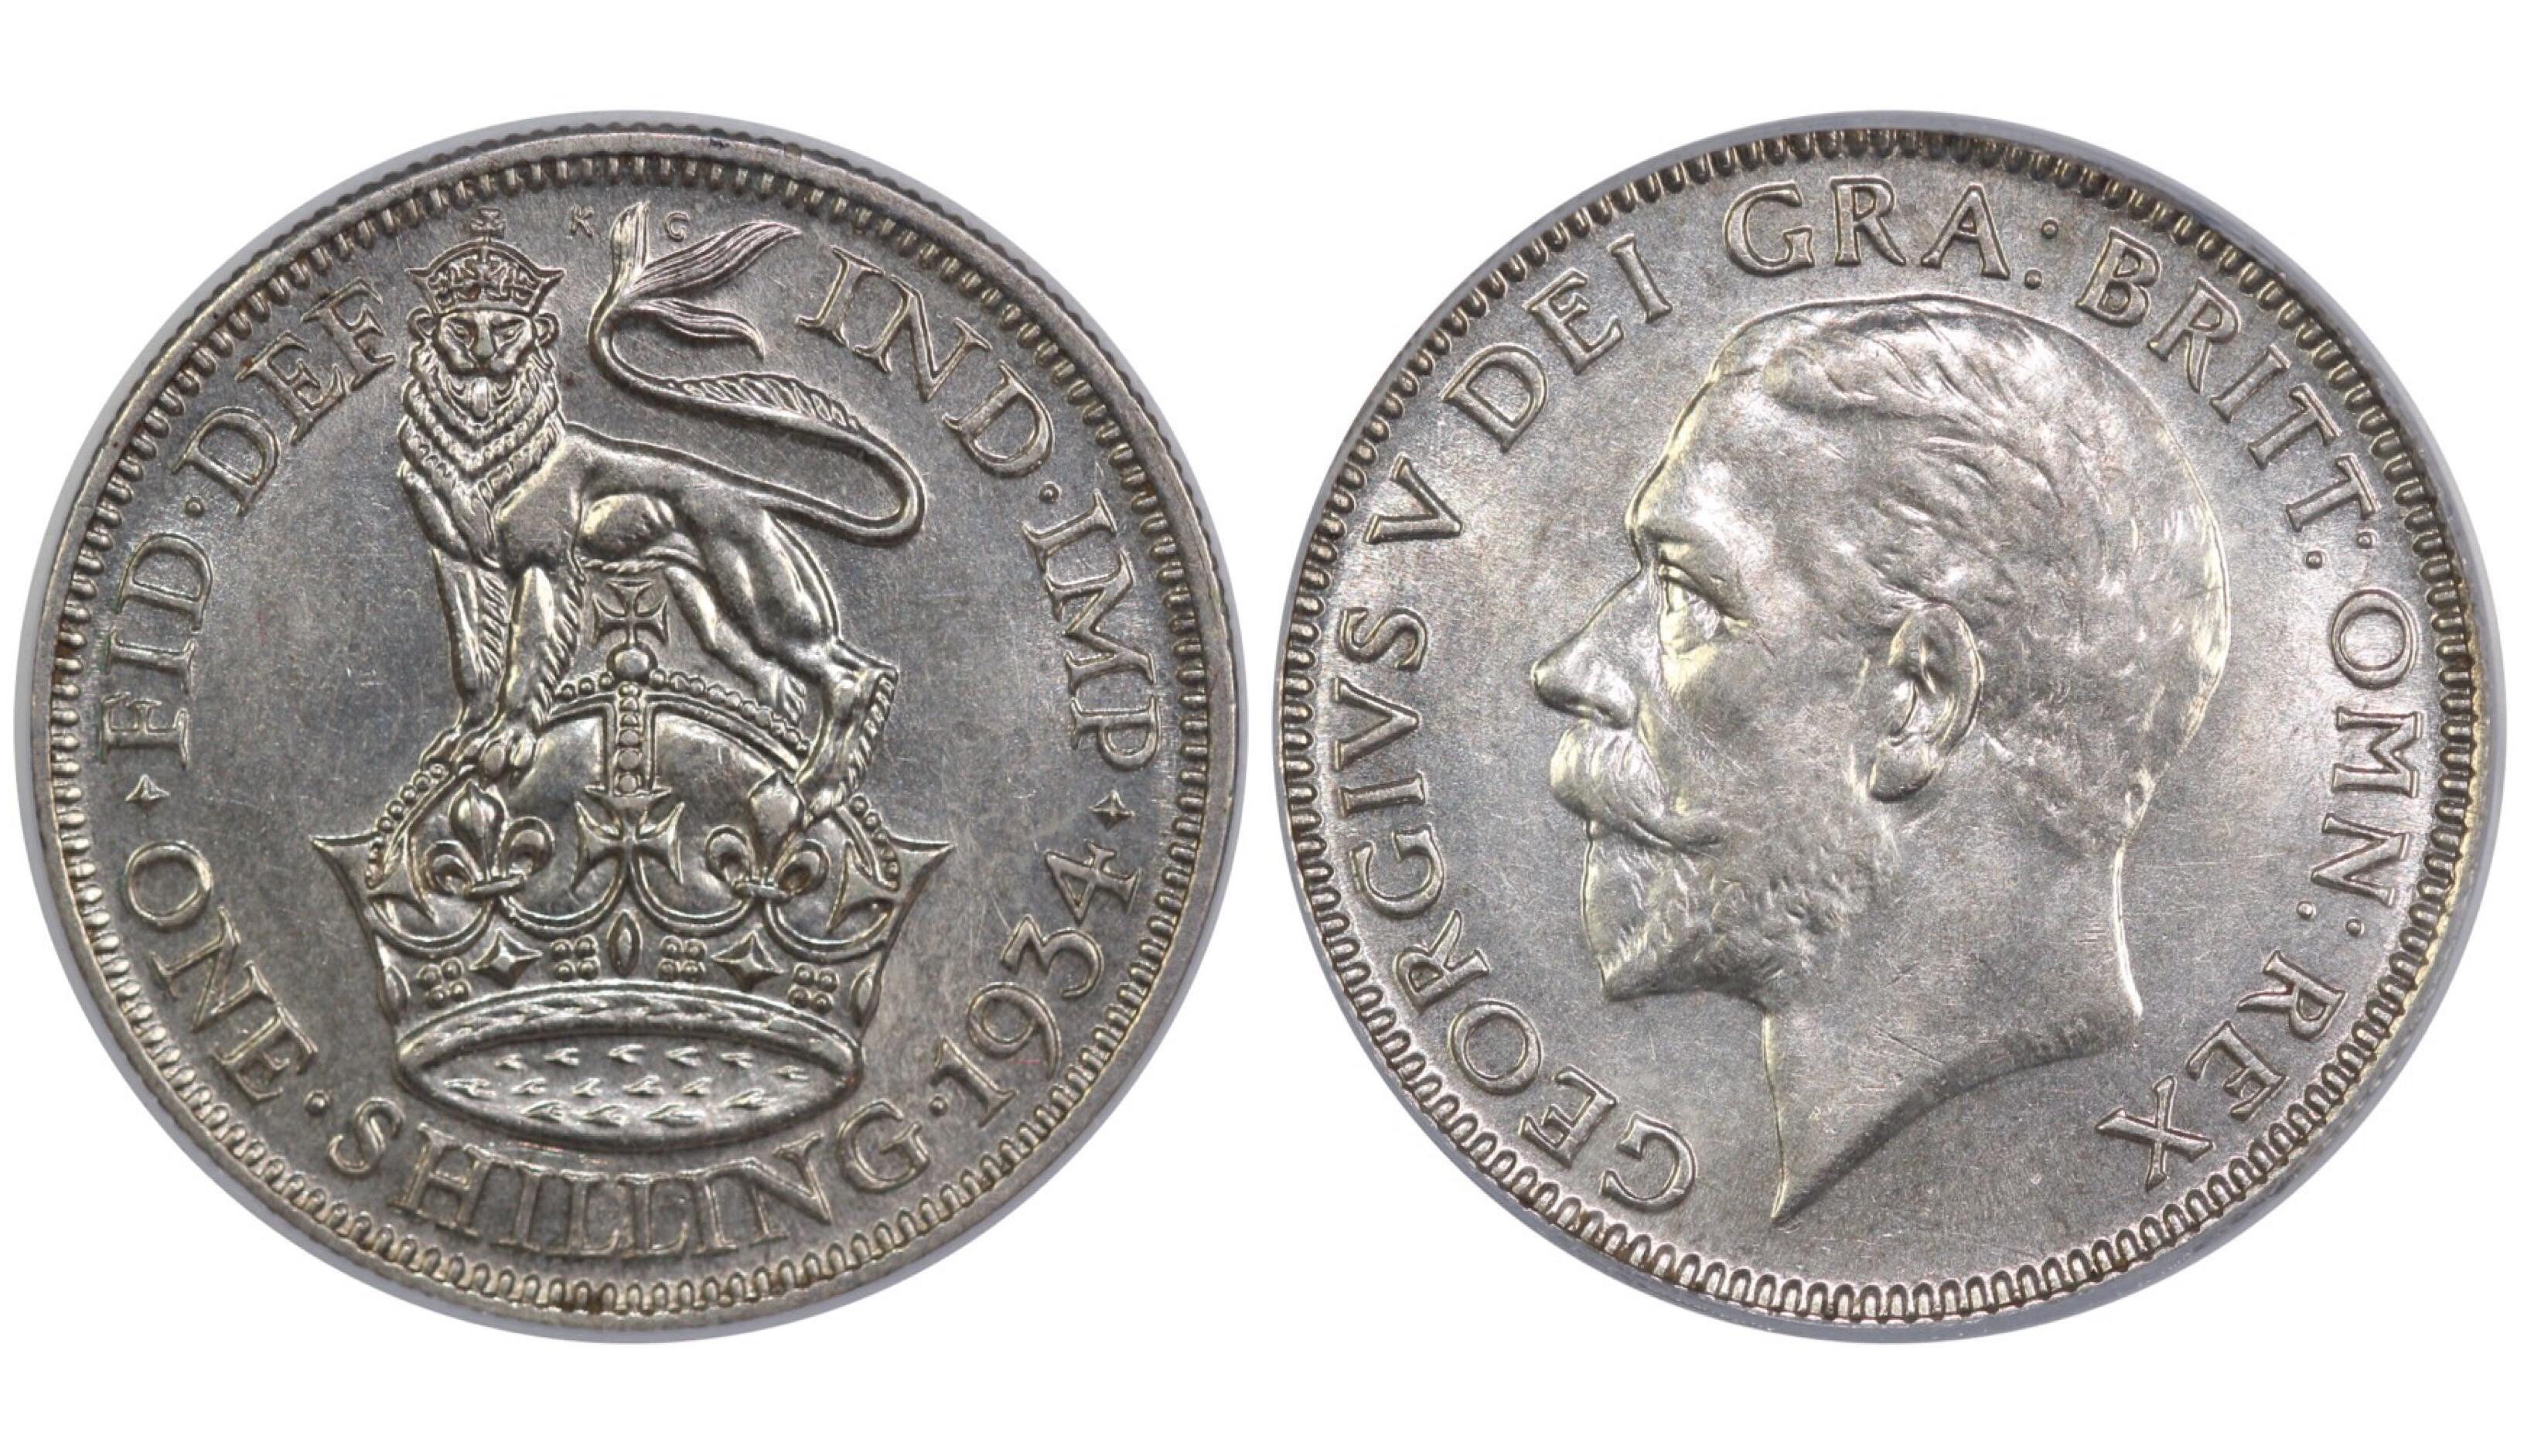 1934 Shilling, CGS 75, George V, ESC 1447, UIN 25658